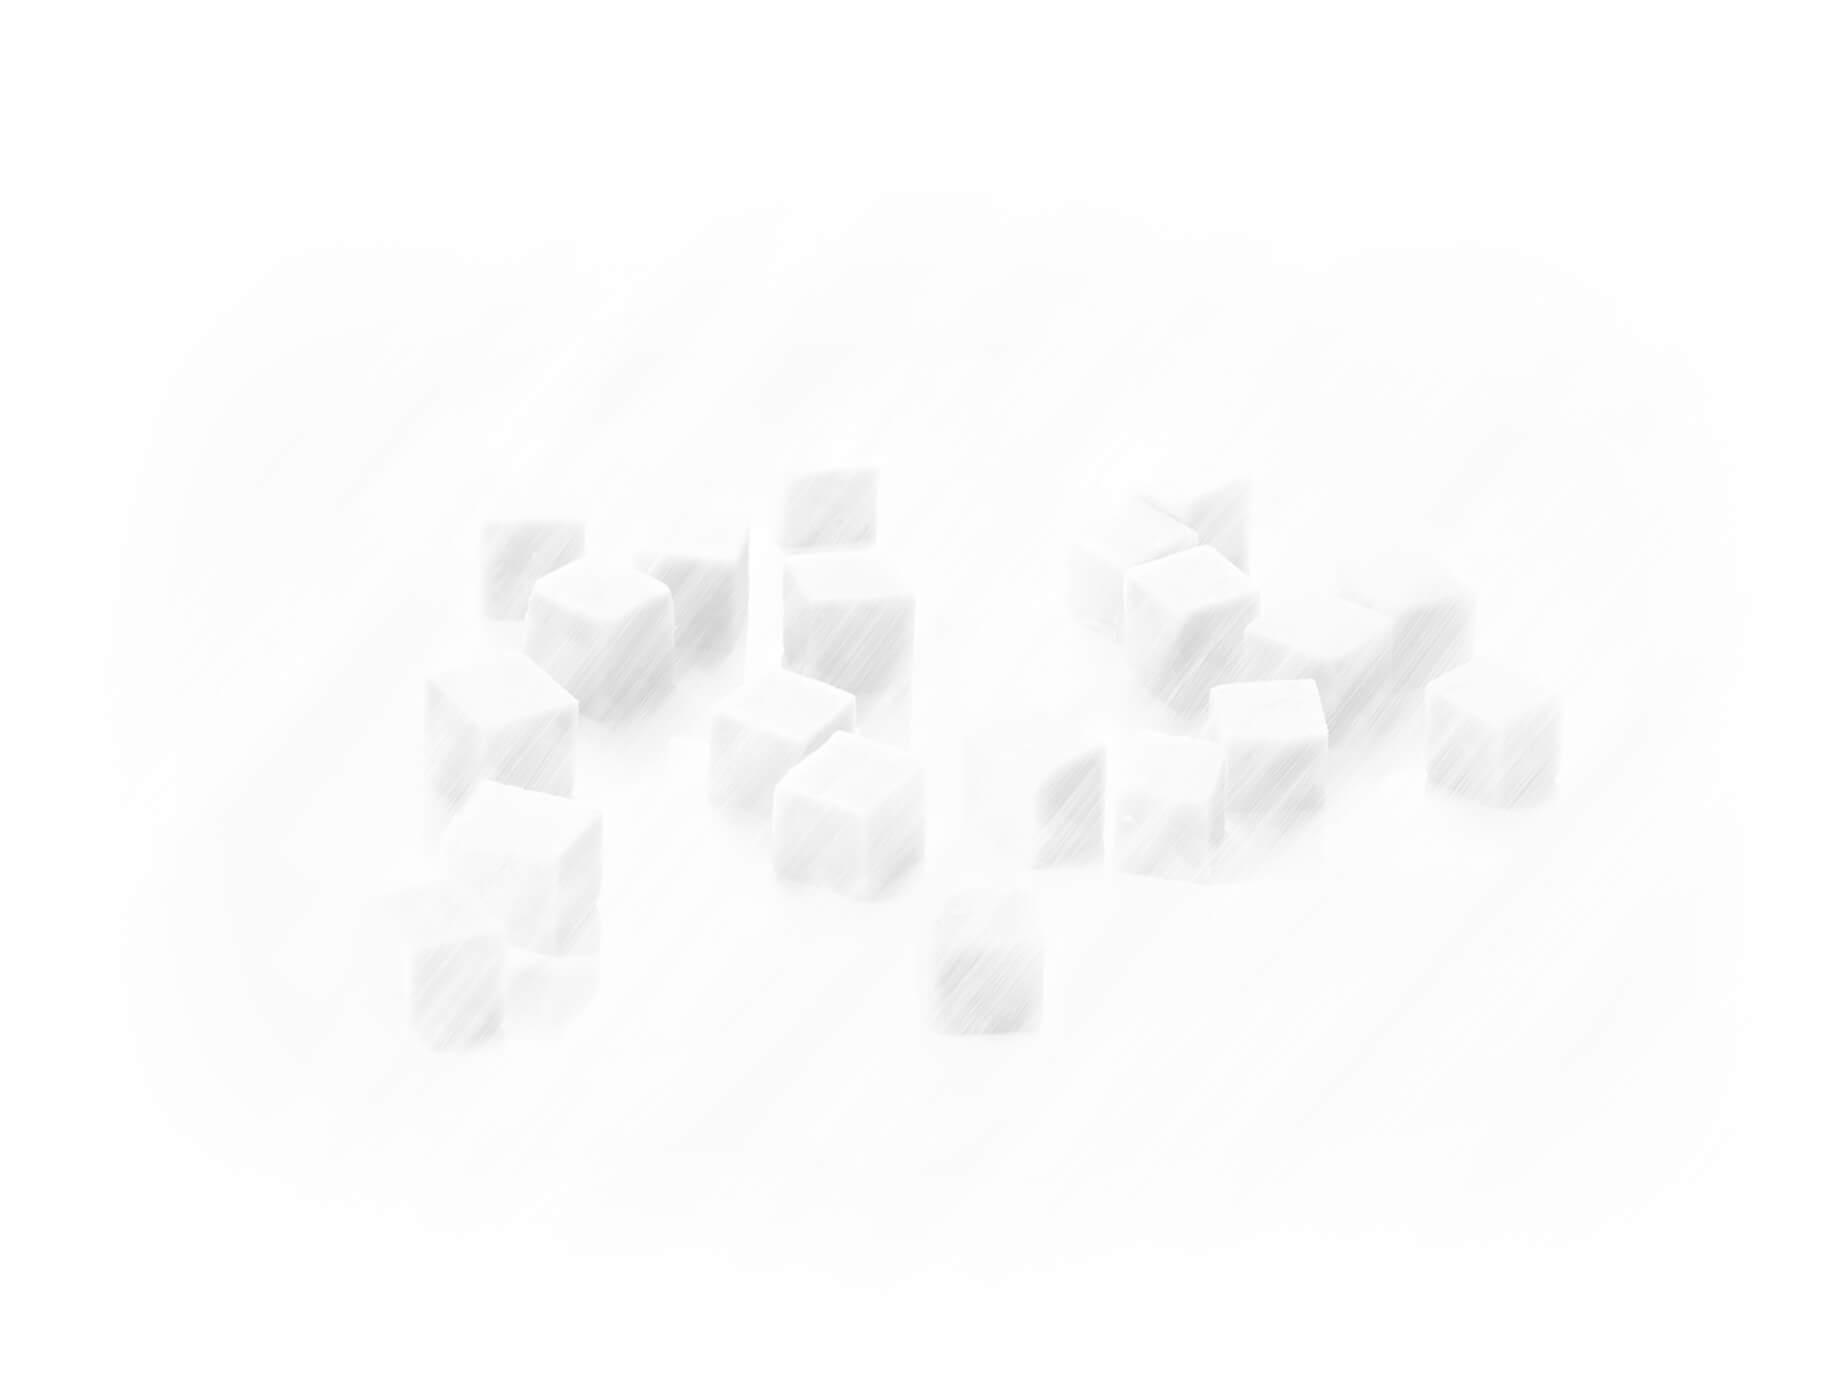 Kaesewuerfel 50Prozent Transparenz.jpg